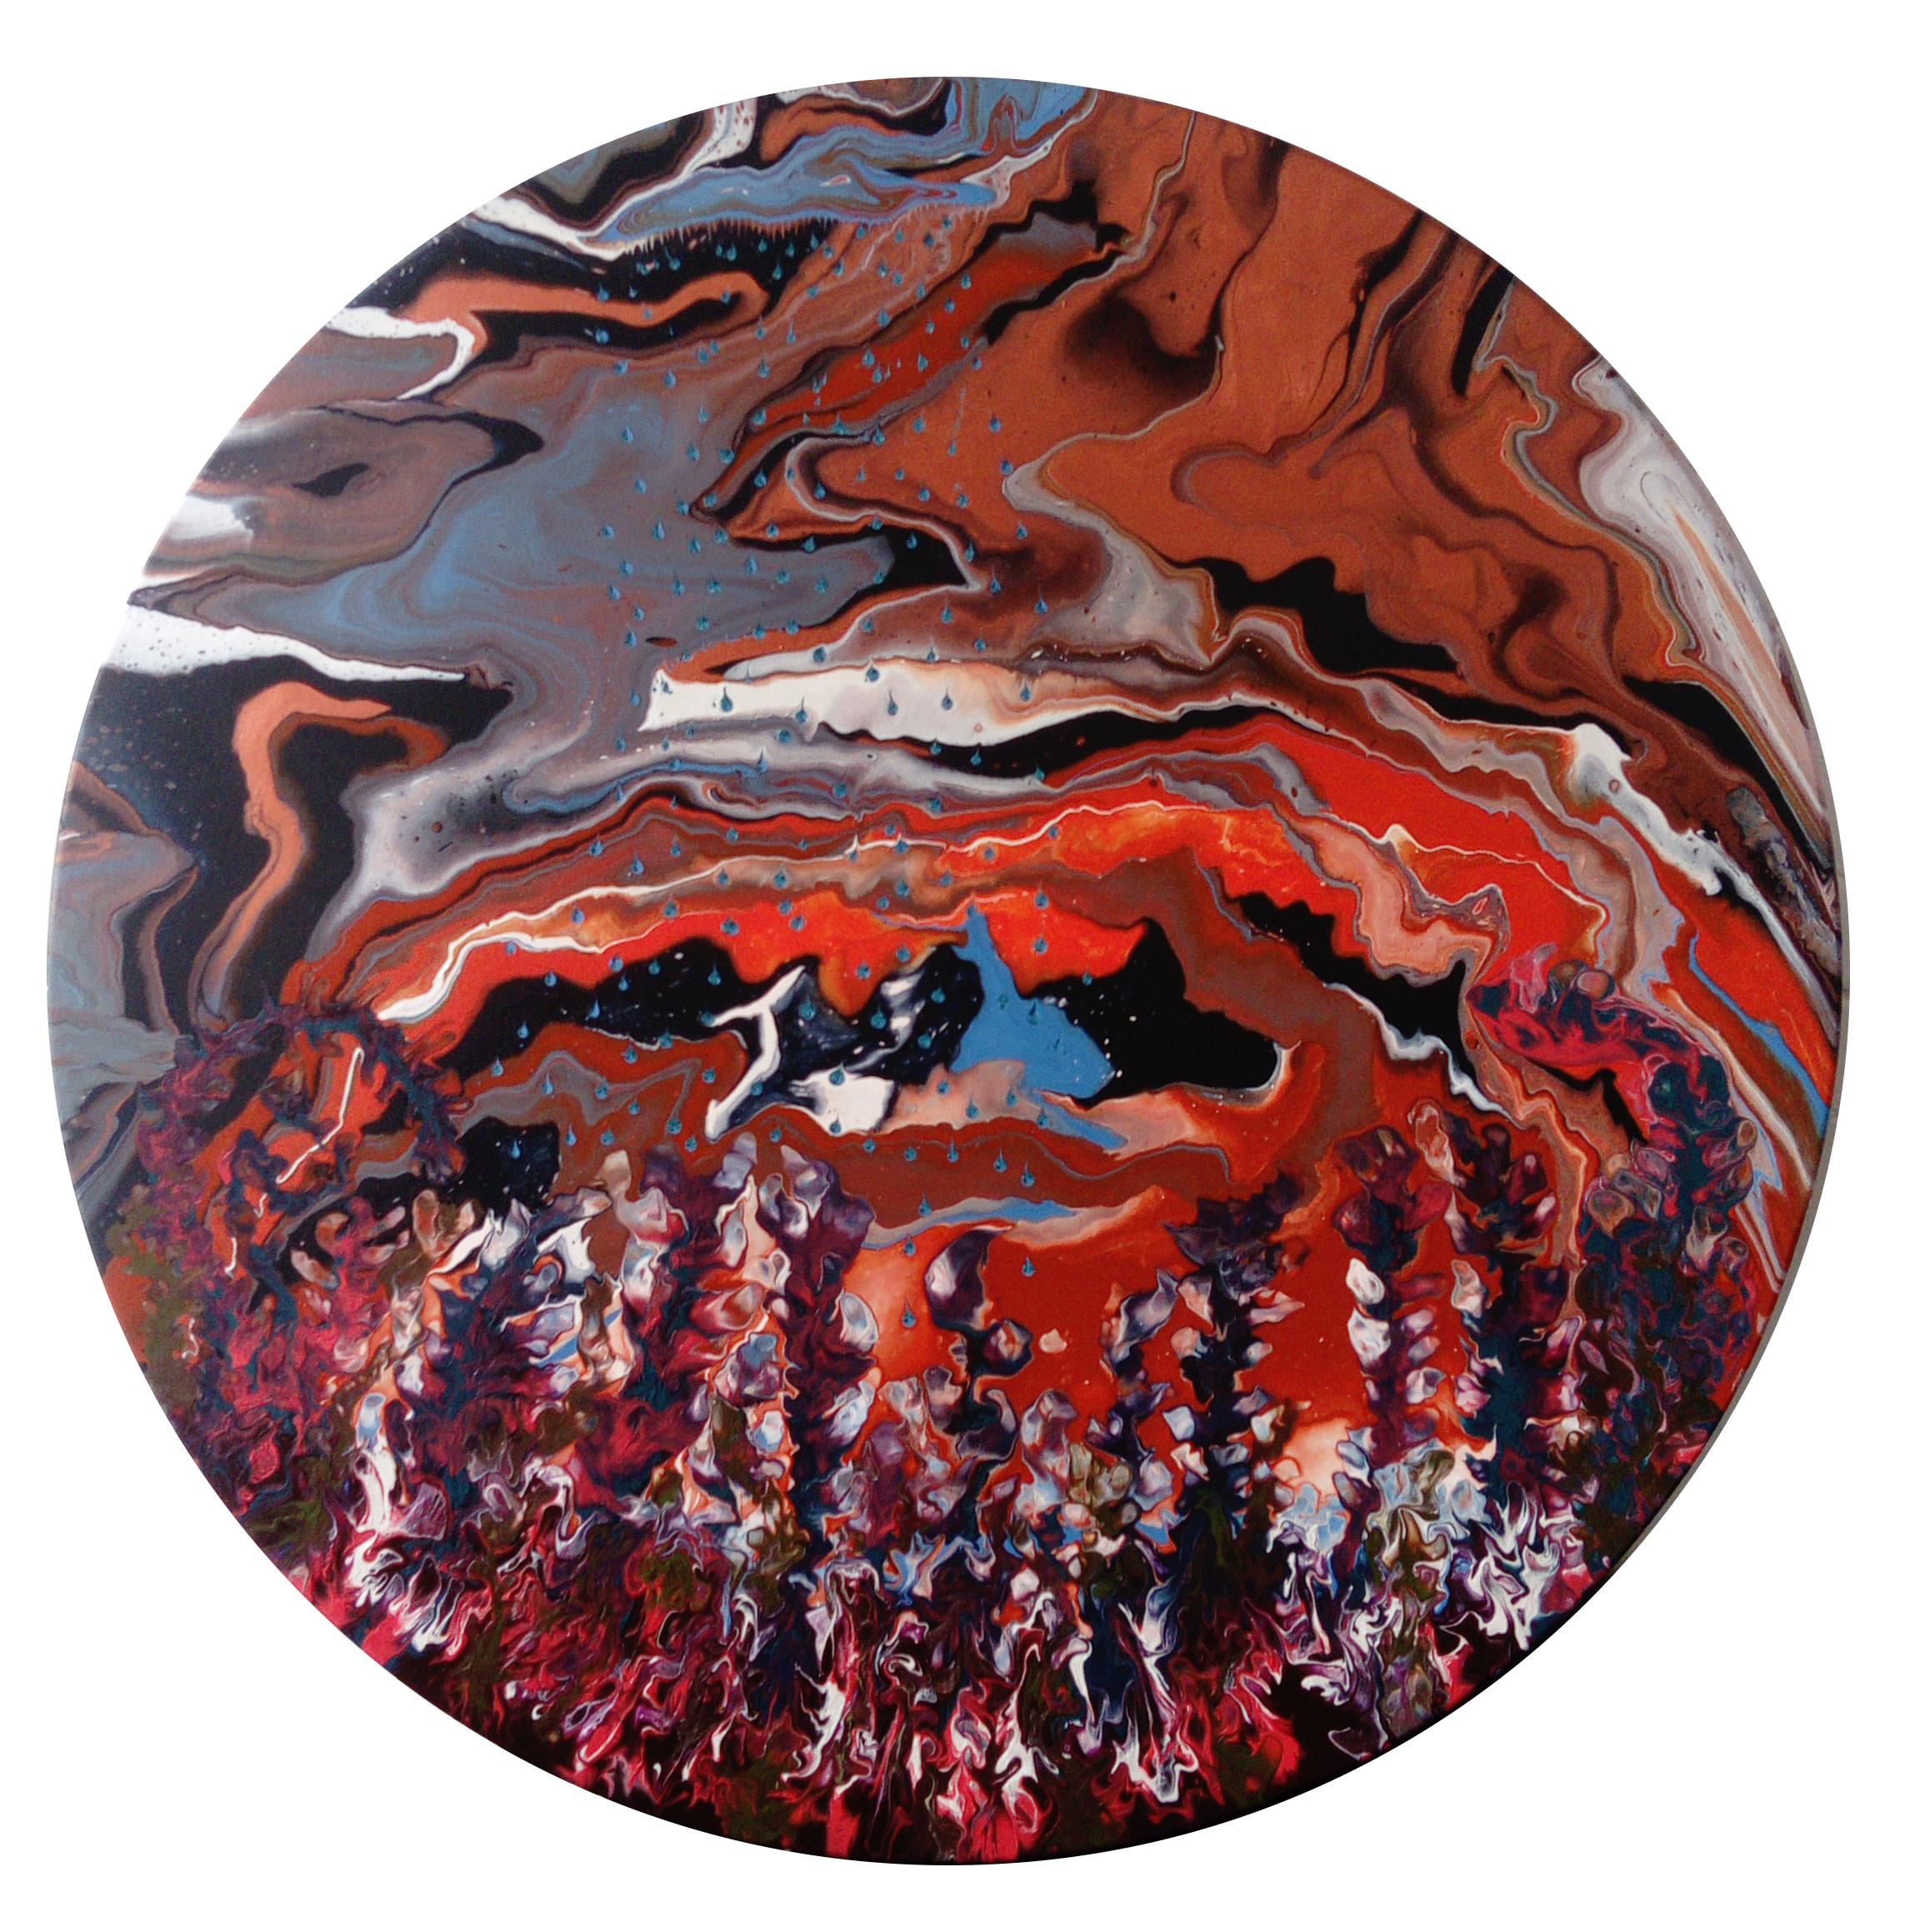 <span class=&#34;link fancybox-details-link&#34;><a href=&#34;/artists/66-elsa-duault/works/5376-elsa-duault-instant-120-4-2018/&#34;>View Detail Page</a></span><div class=&#34;artist&#34;><strong>Elsa Duault</strong></div> 1992 <div class=&#34;title&#34;><em>INSTANT 120-4</em>, 2018</div> <div class=&#34;medium&#34;>Acrylic on canvas</div> <div class=&#34;dimensions&#34;>120cm Diameter Framed: 1225mm diameter</div><div class=&#34;copyright_line&#34;>Copyright The Artist</div>